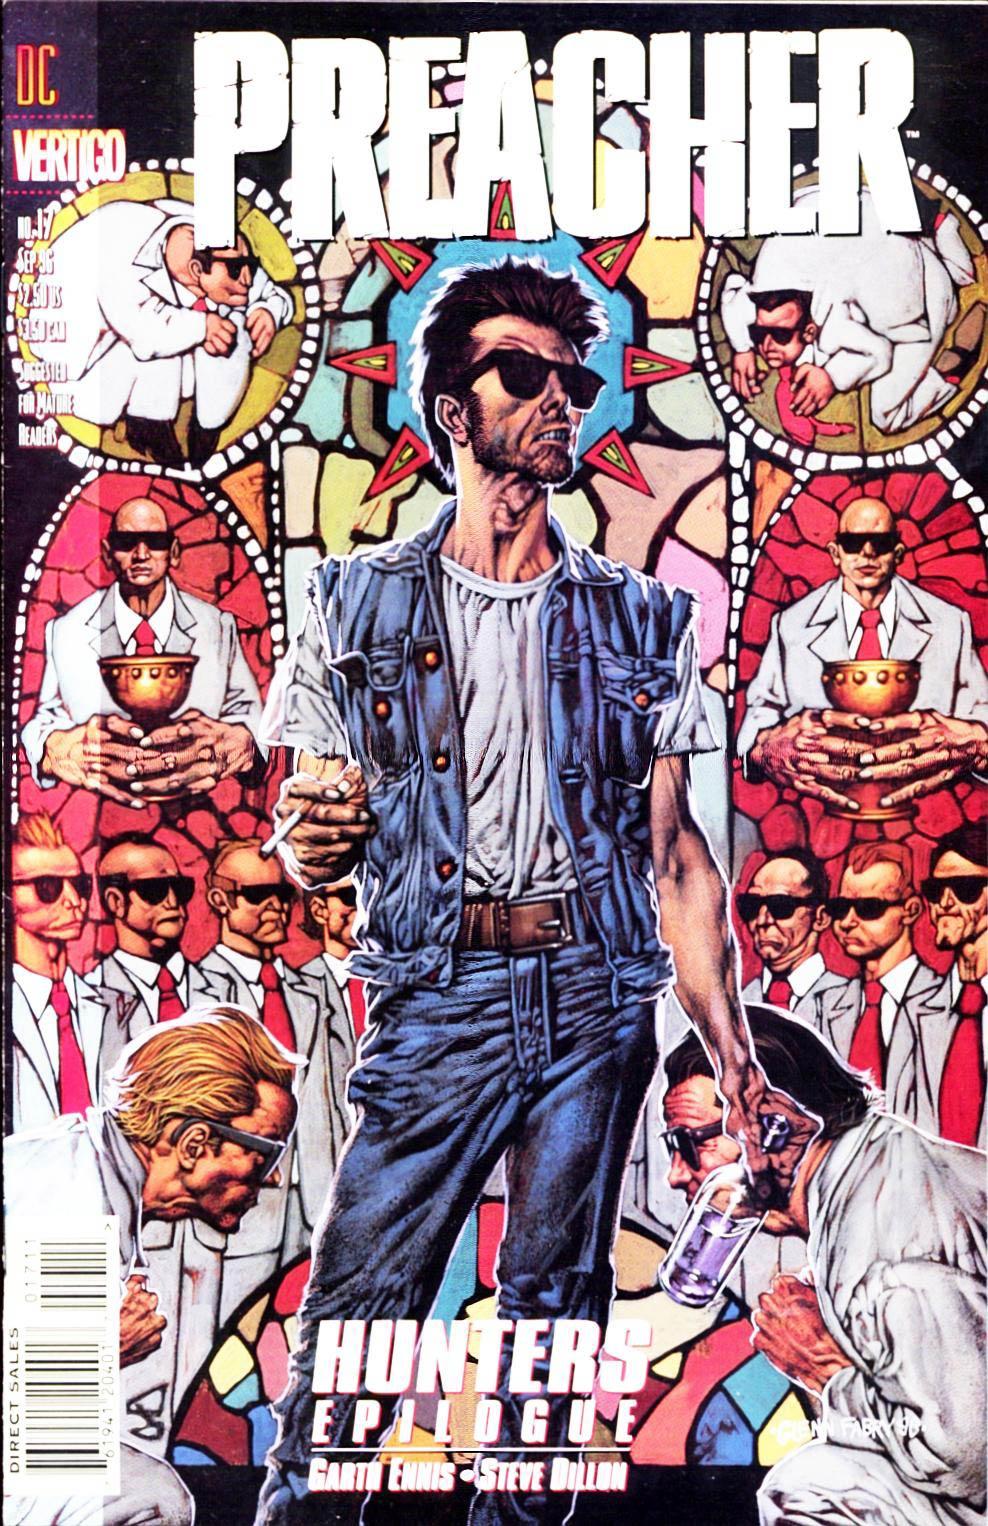 Комиксы Онлайн - Проповедник - # 17 - Страница №1 - Preacher - Preacher # 17